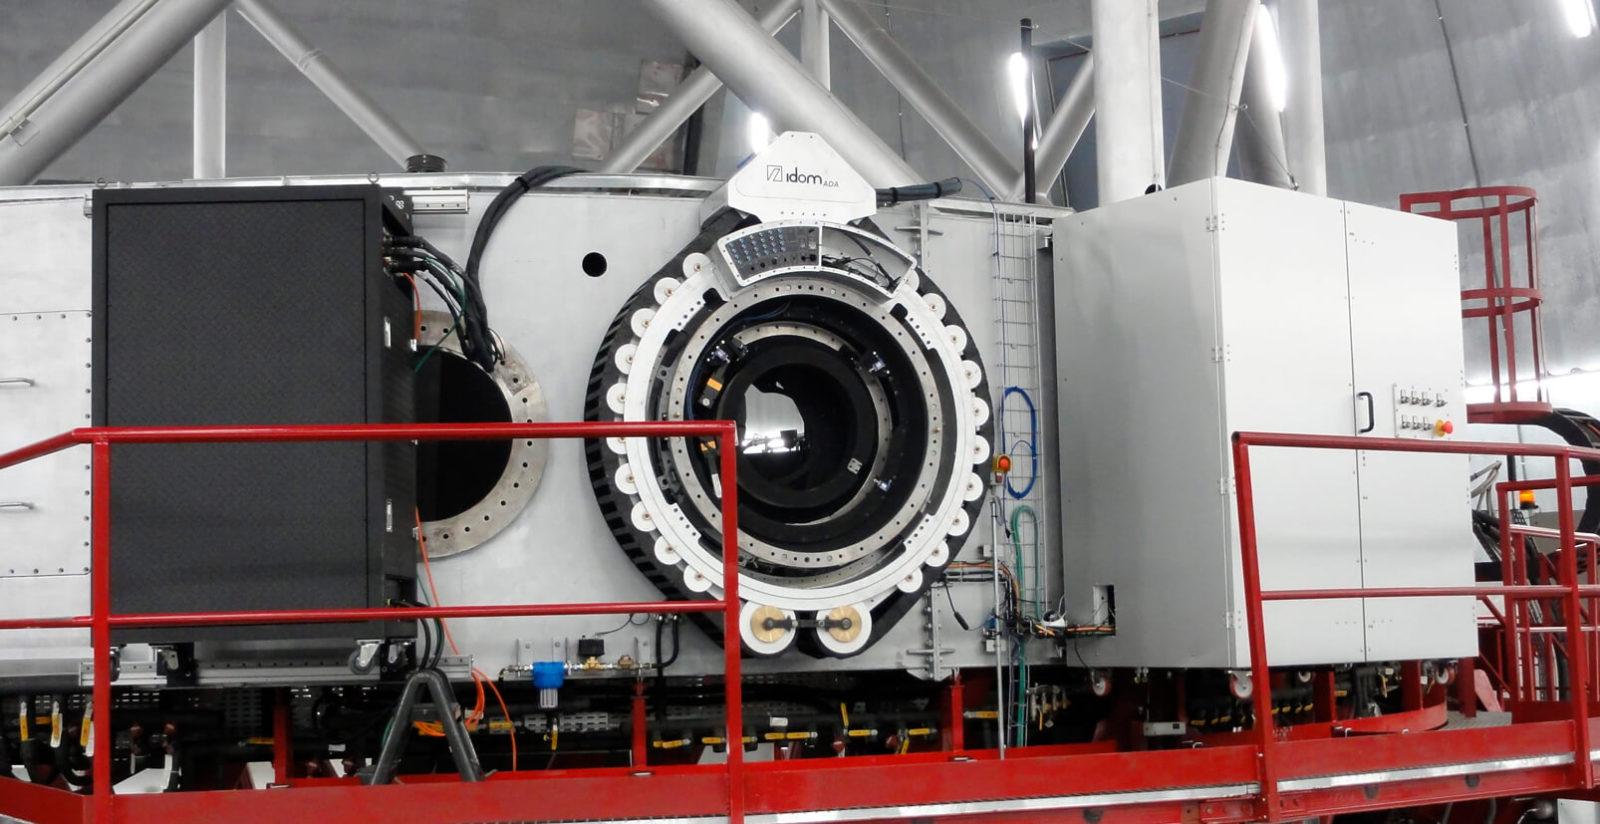 Telescope_Field_Rotator_Gran_Telescopio_Canarias_Idom_ADA_3_